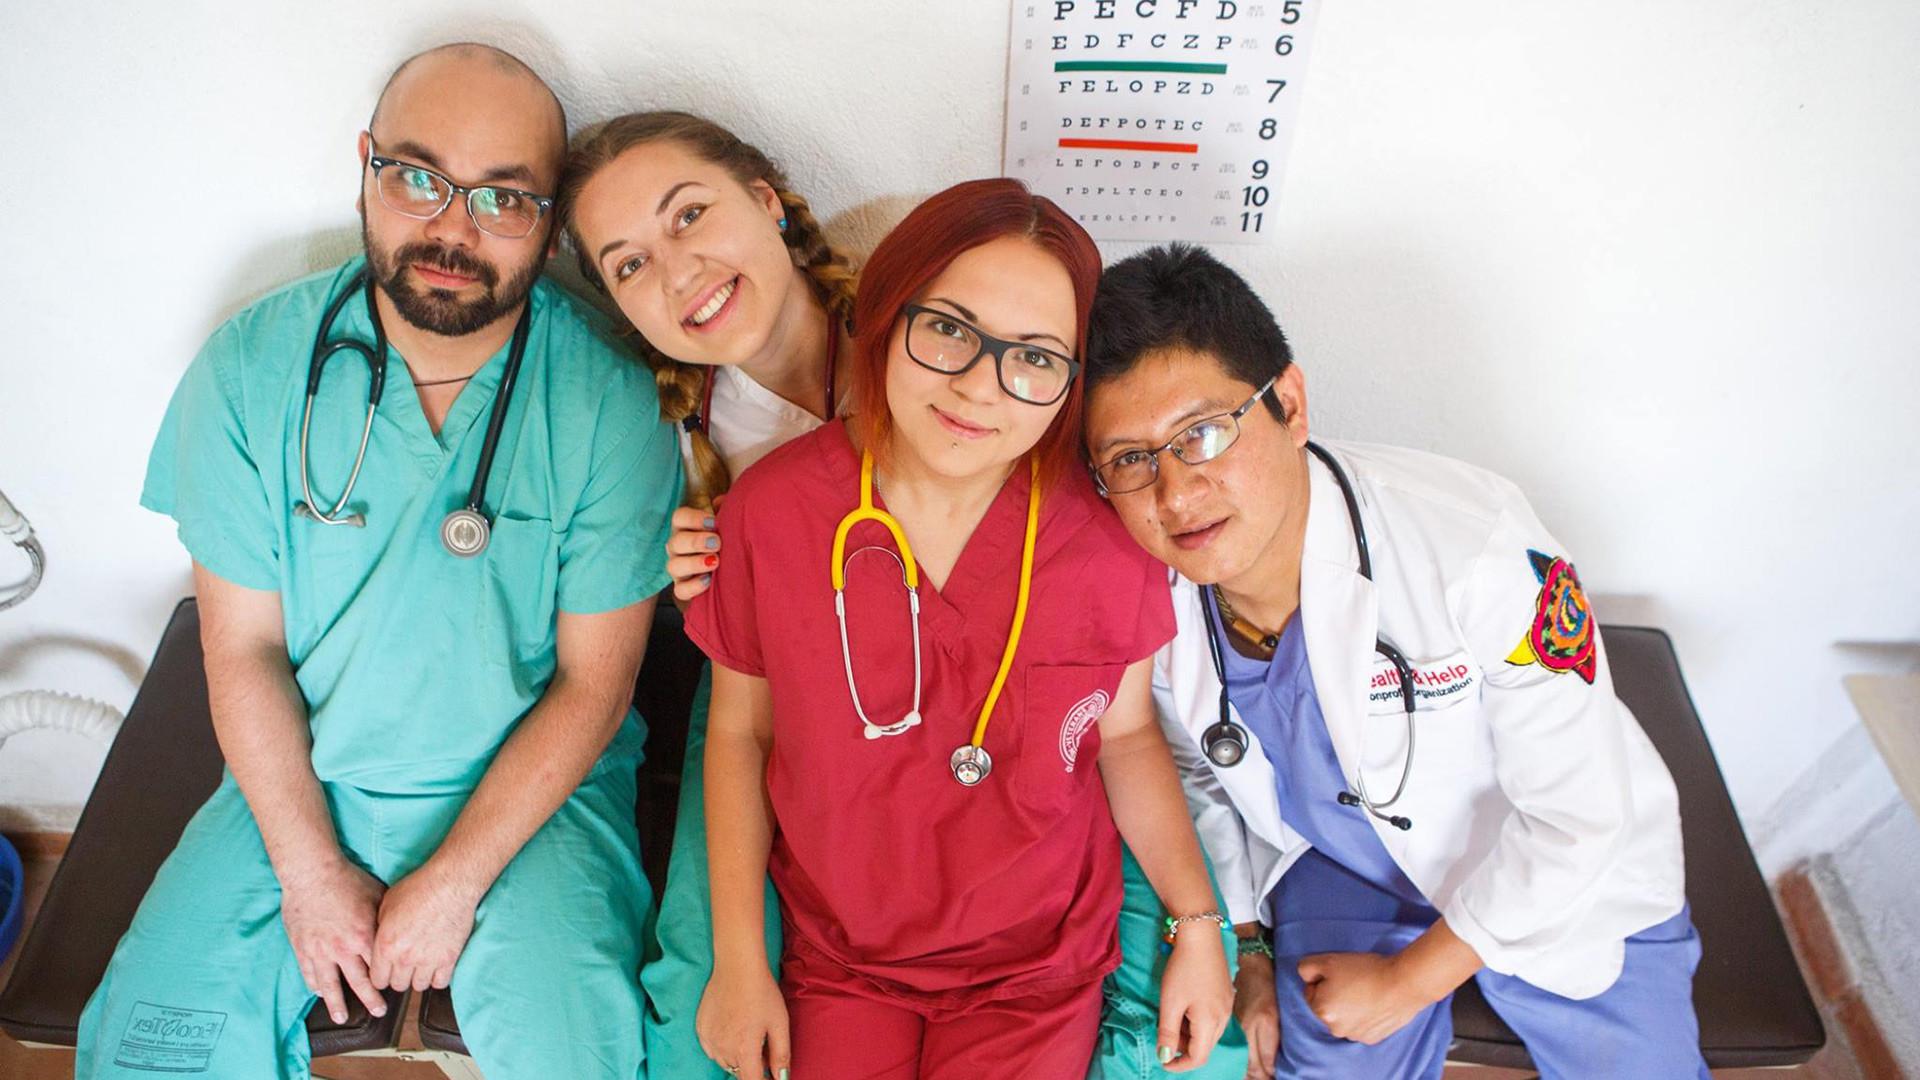 Viktoriya Valikova (kedua kanan) bersama Karina Basharova (kedua kiri) mendirikan organisasi nonprofit Health & Help